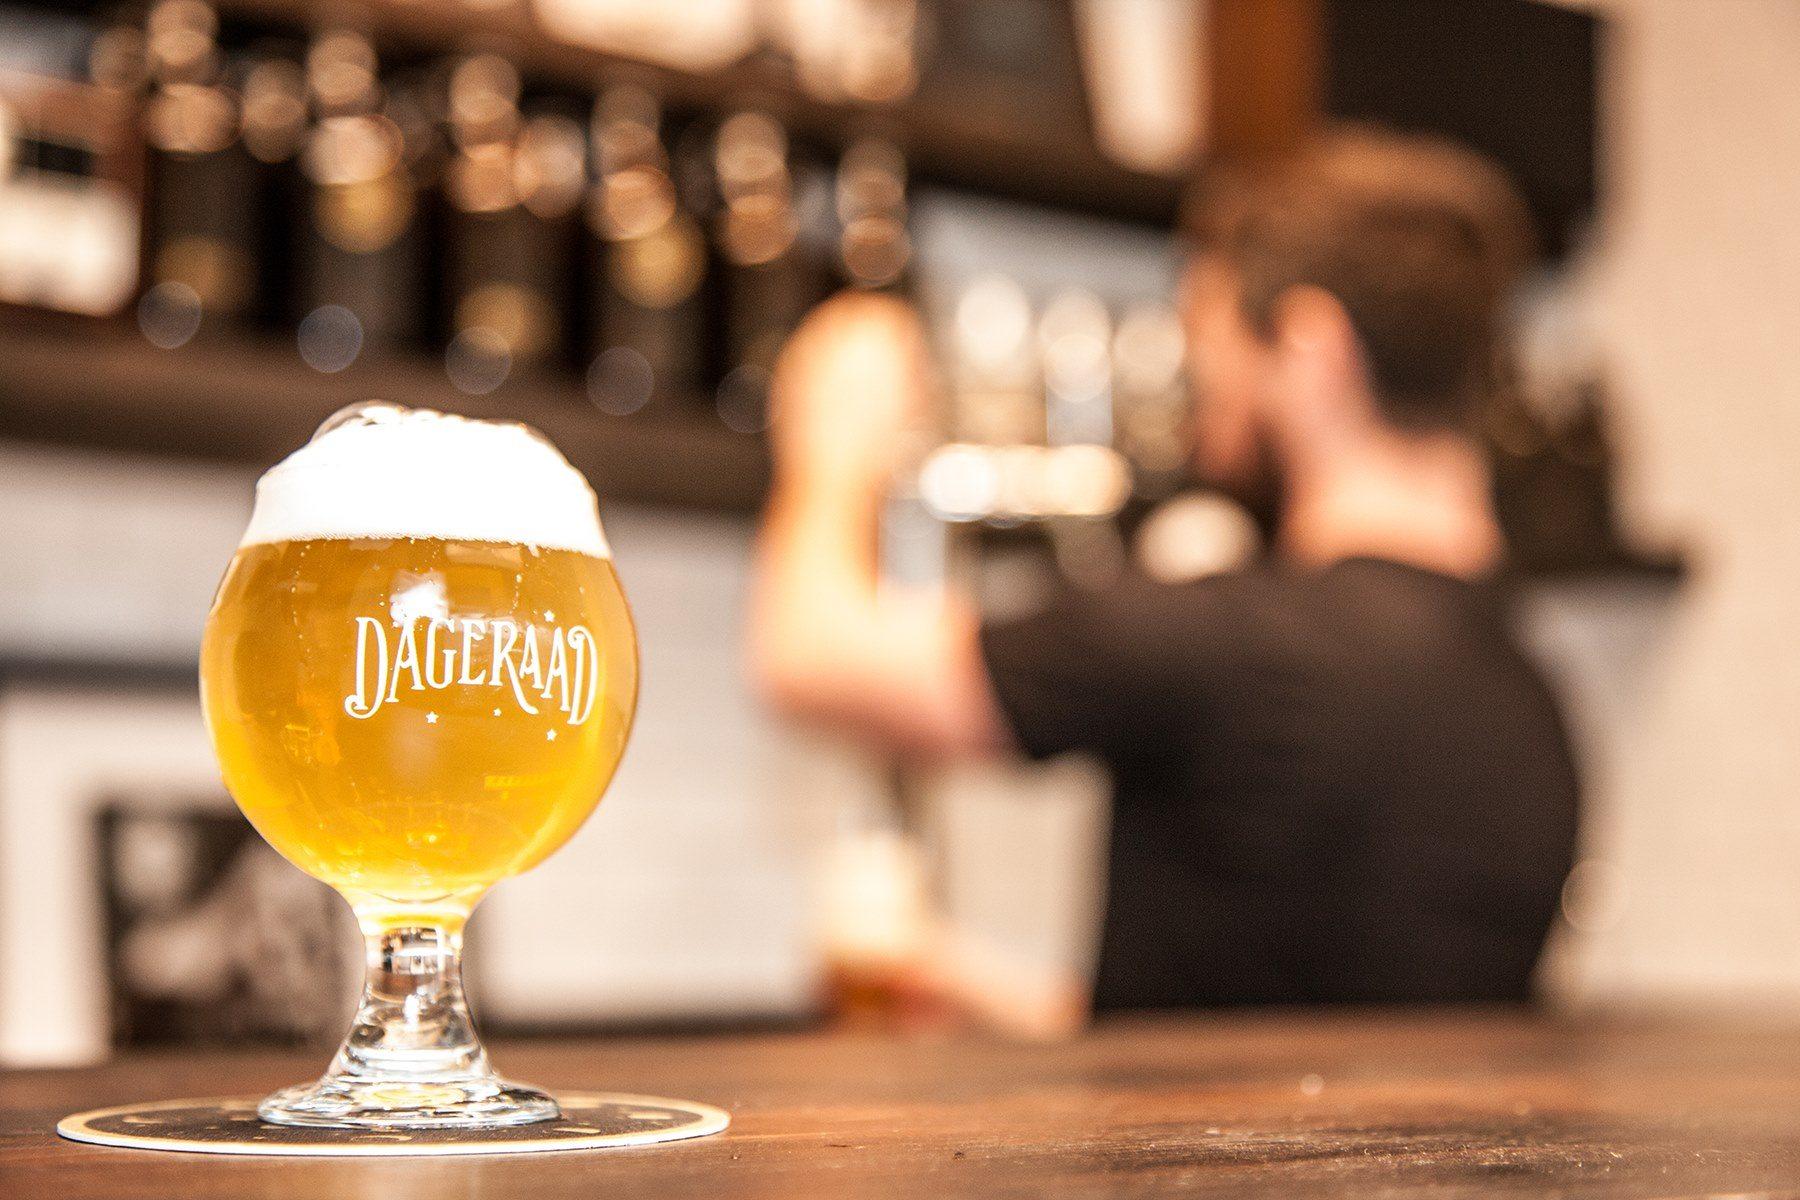 Taste a little craft beer (Dageraad Brewing/Facebook)